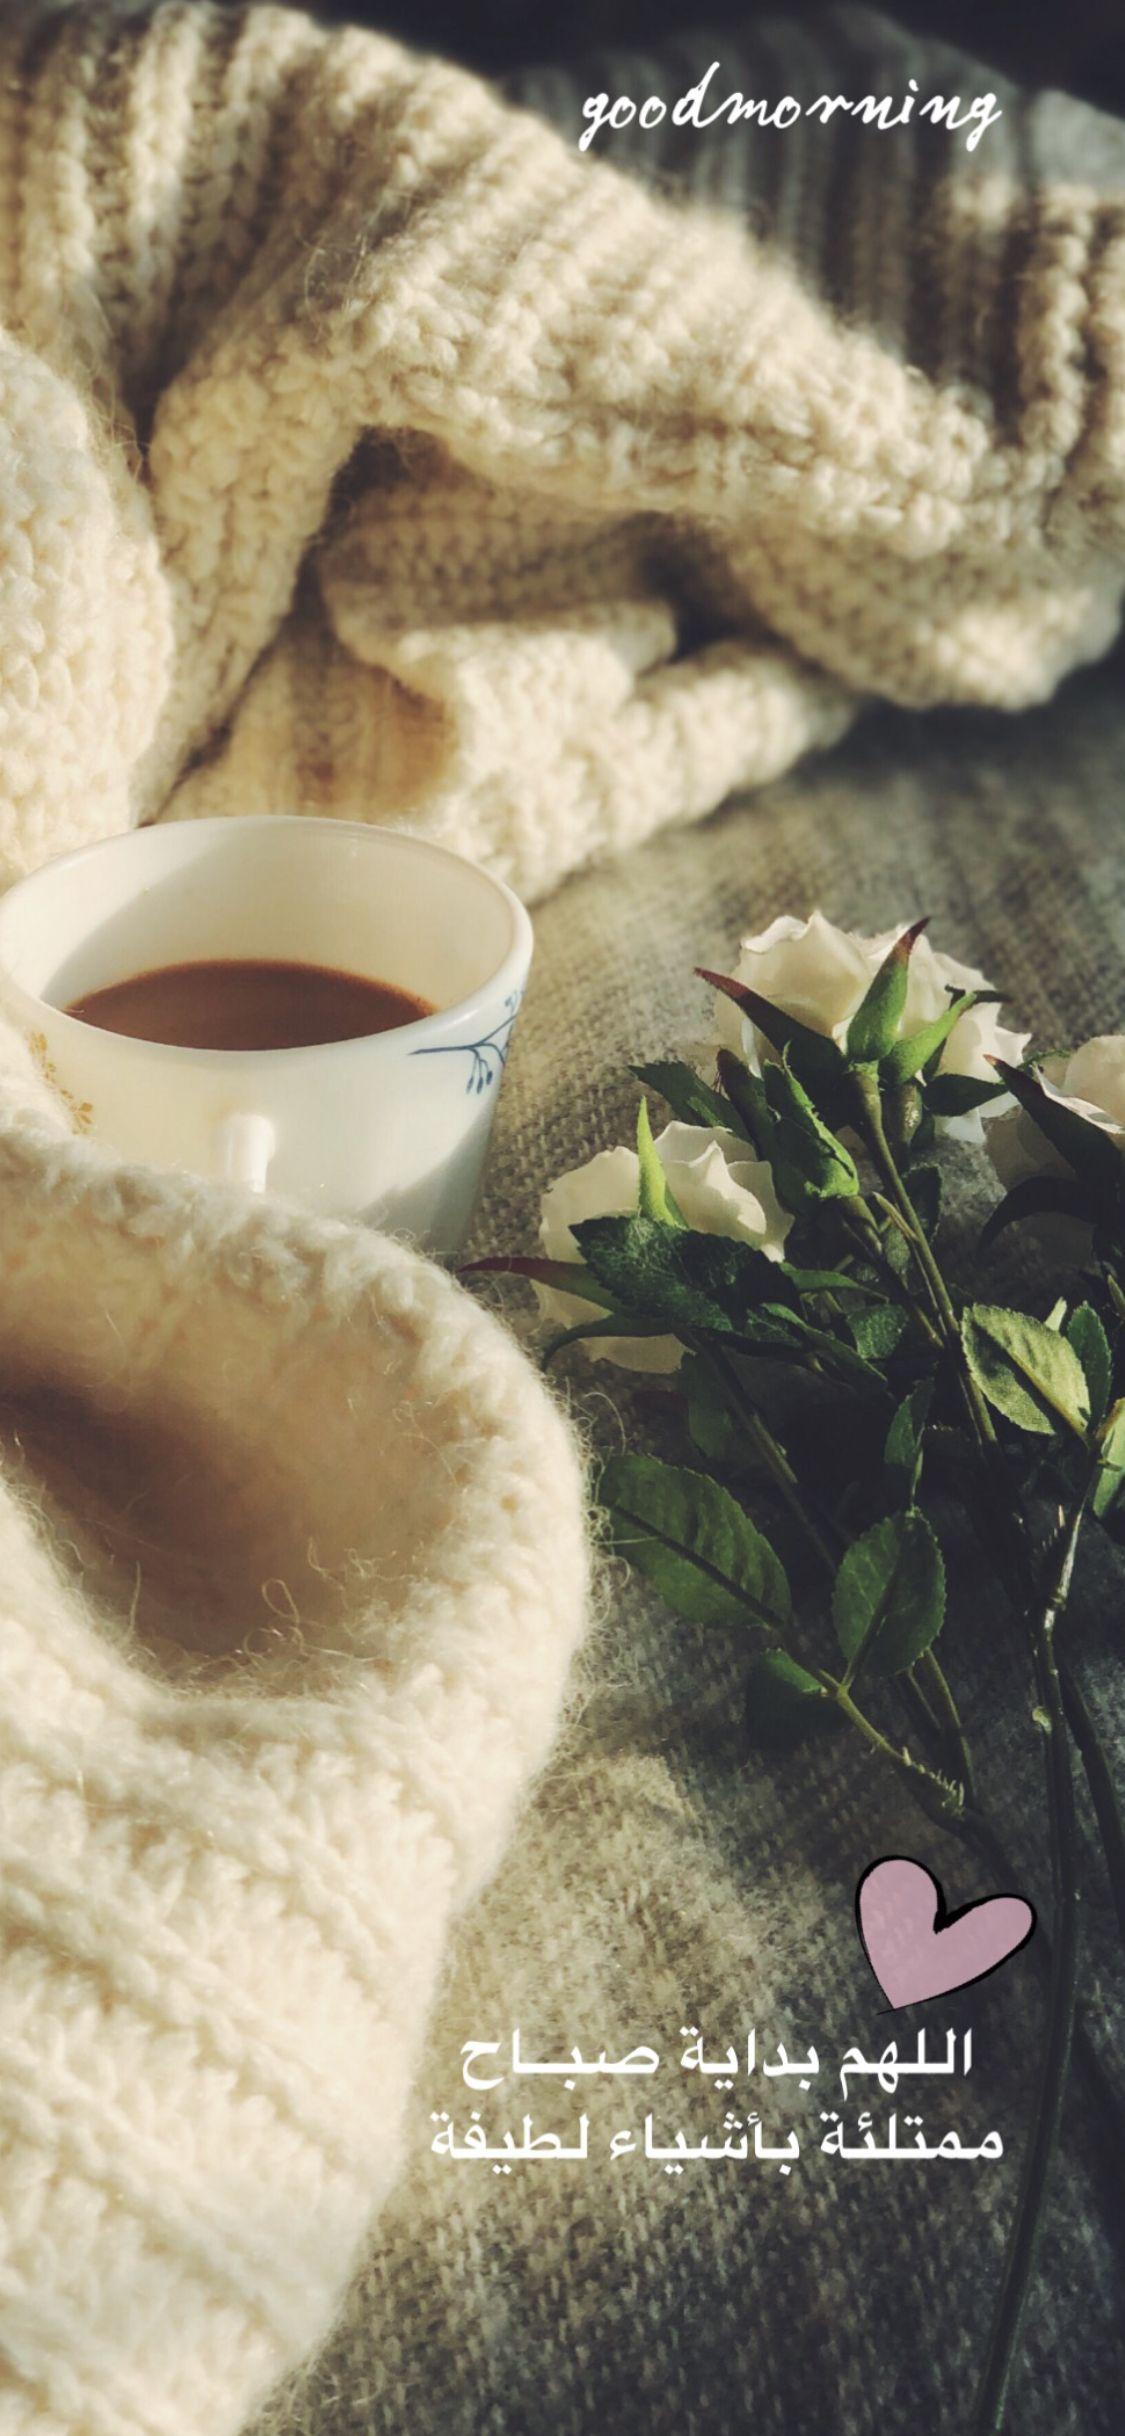 الصباح Positive Notes Words Coffee Tea